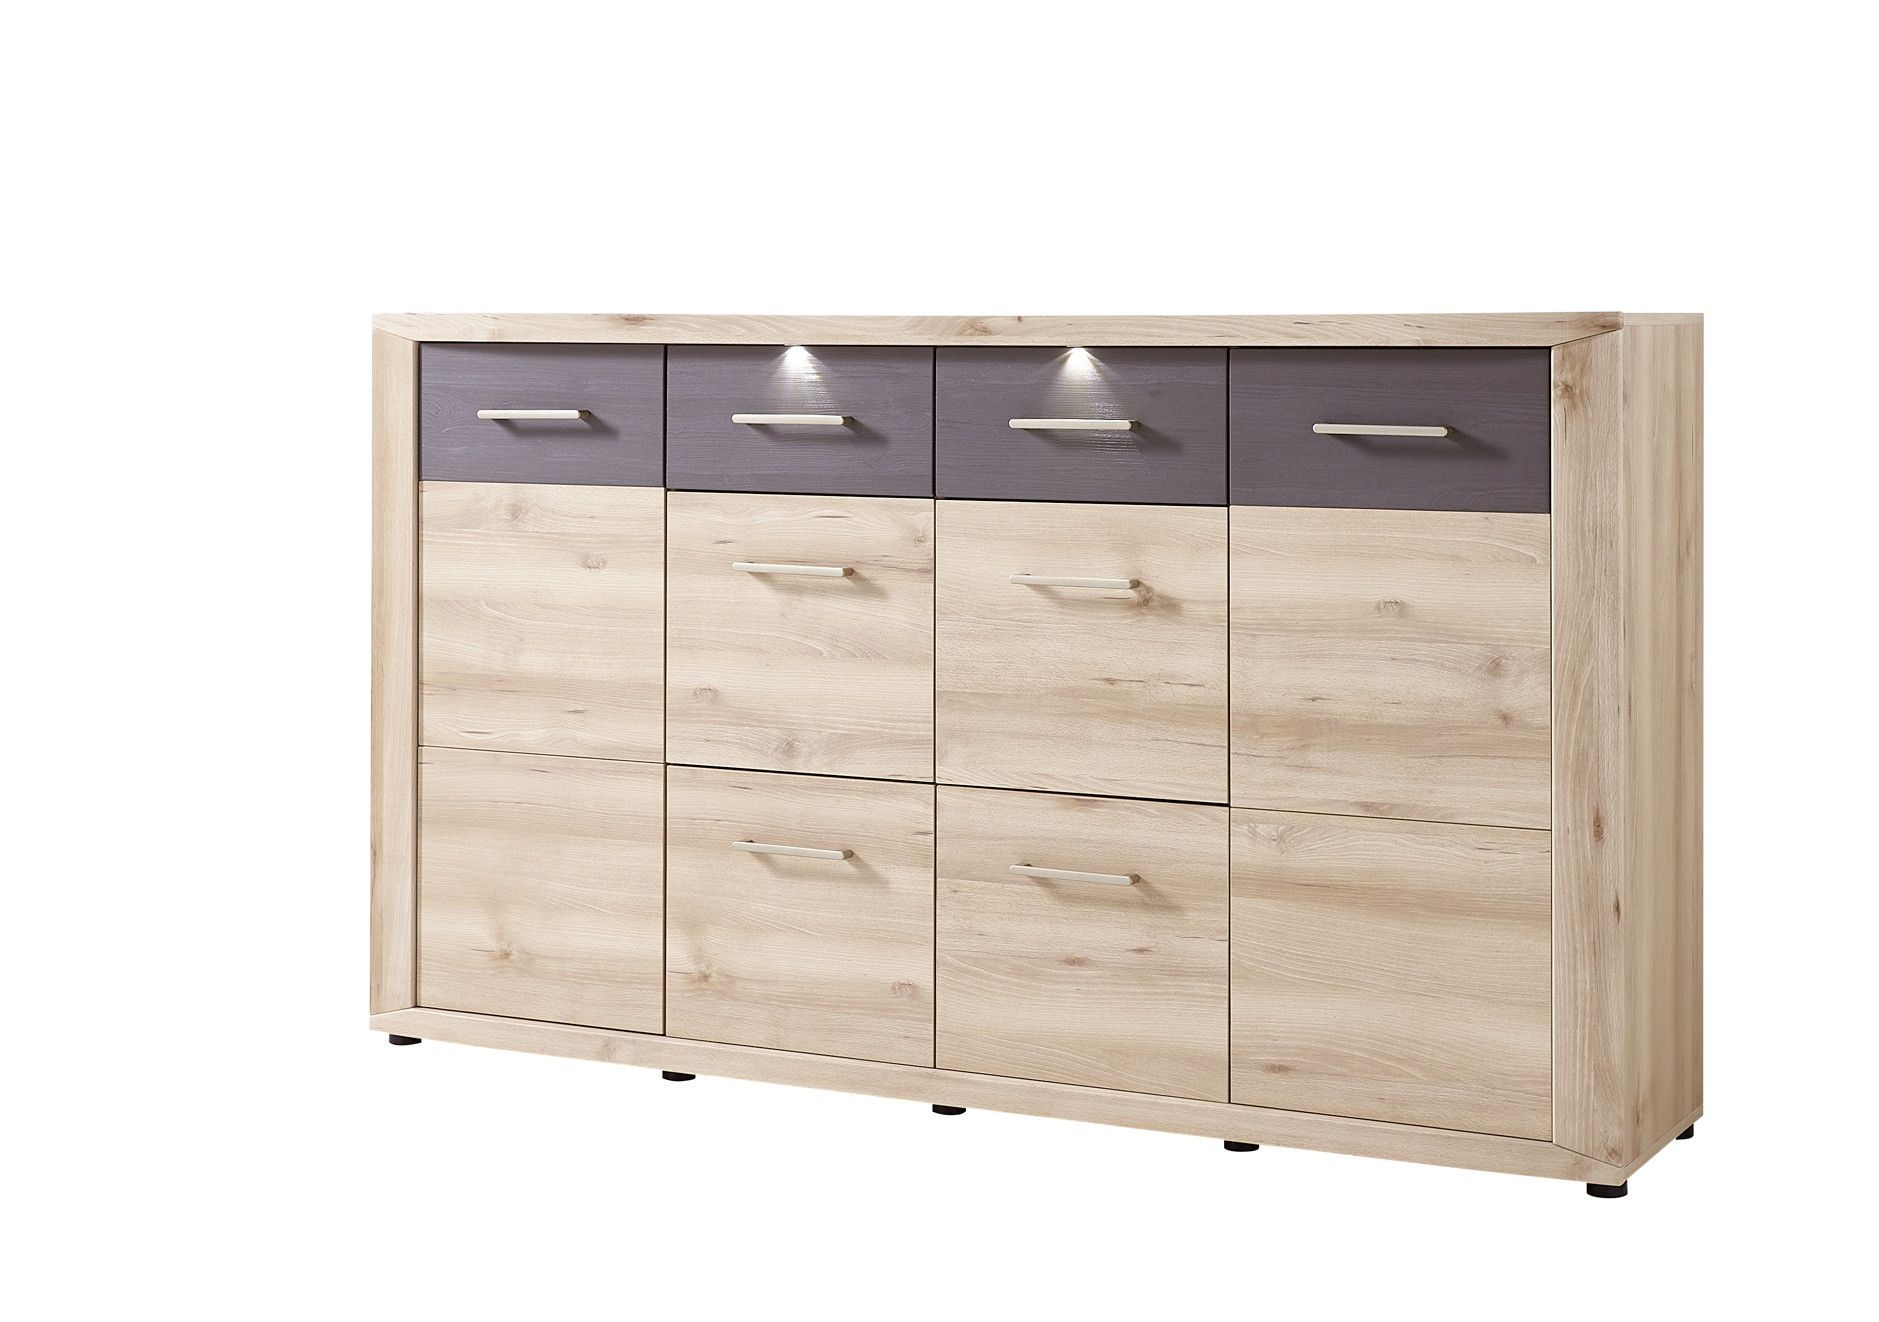 kommode buche hell grau struktur woody 22 00912 mdf modern jetzt bestellen unter https. Black Bedroom Furniture Sets. Home Design Ideas